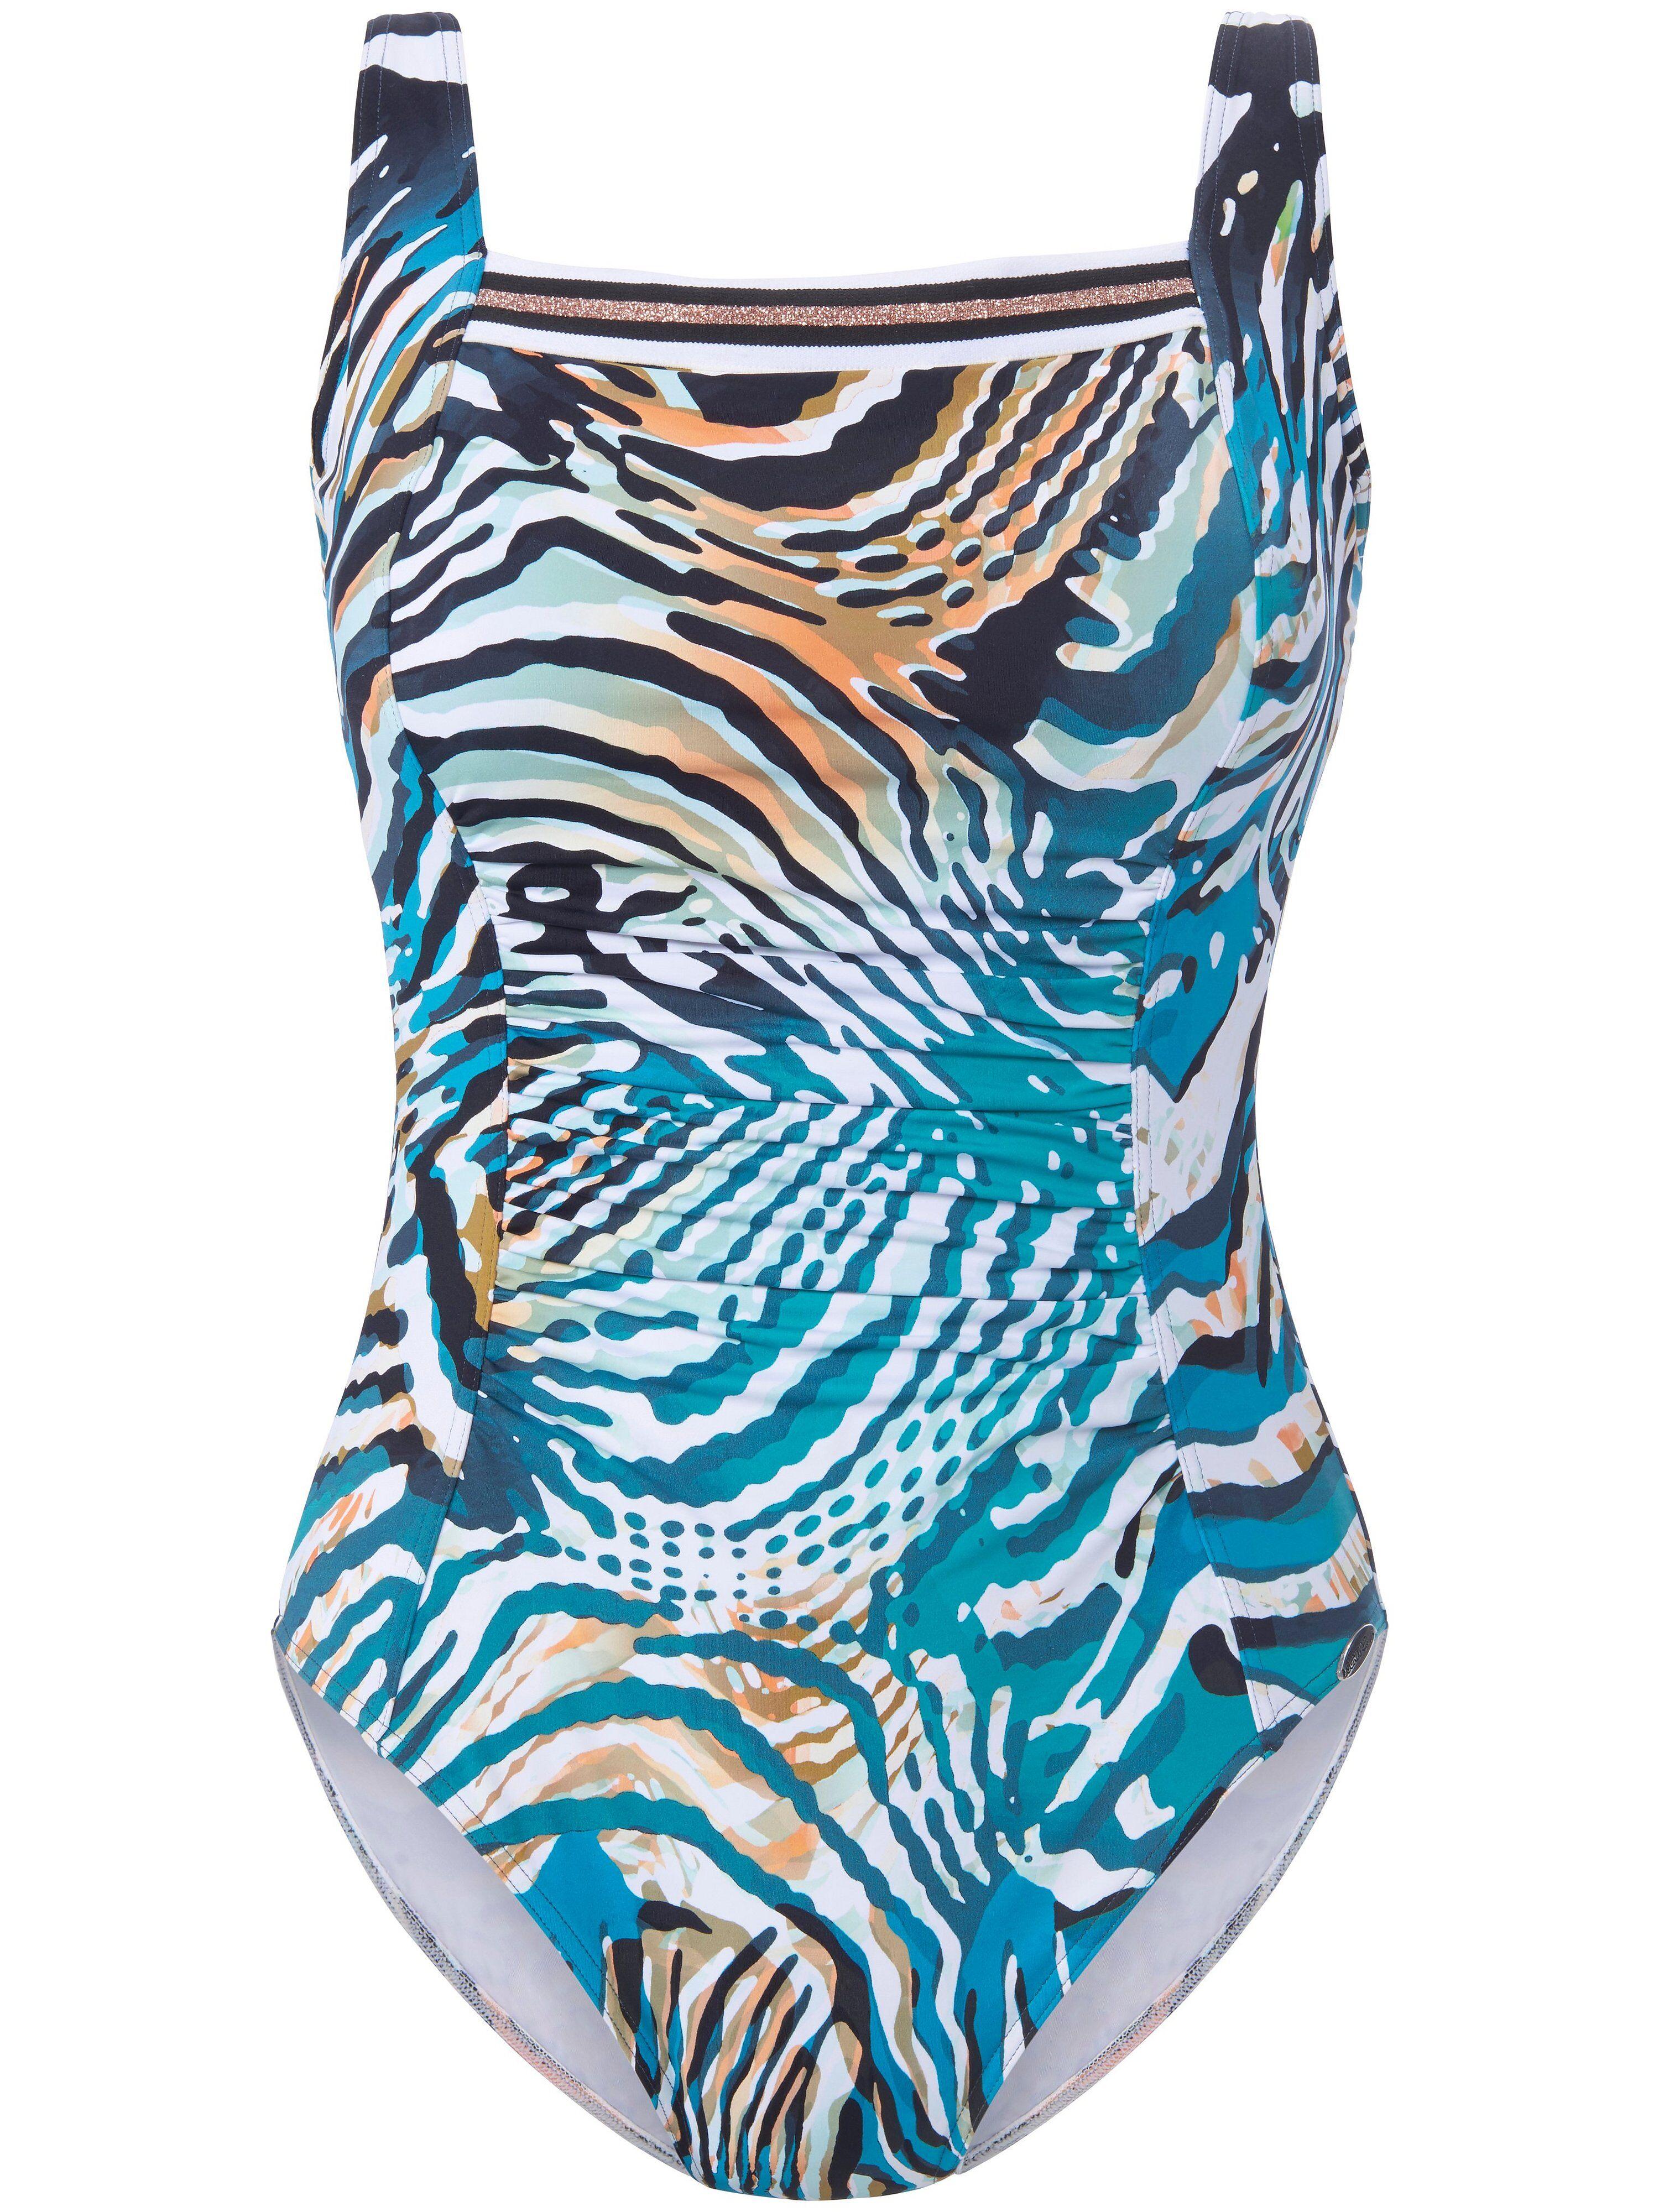 Sunflair Le maillot bain  Sunflair turquoise  - Femme - 46